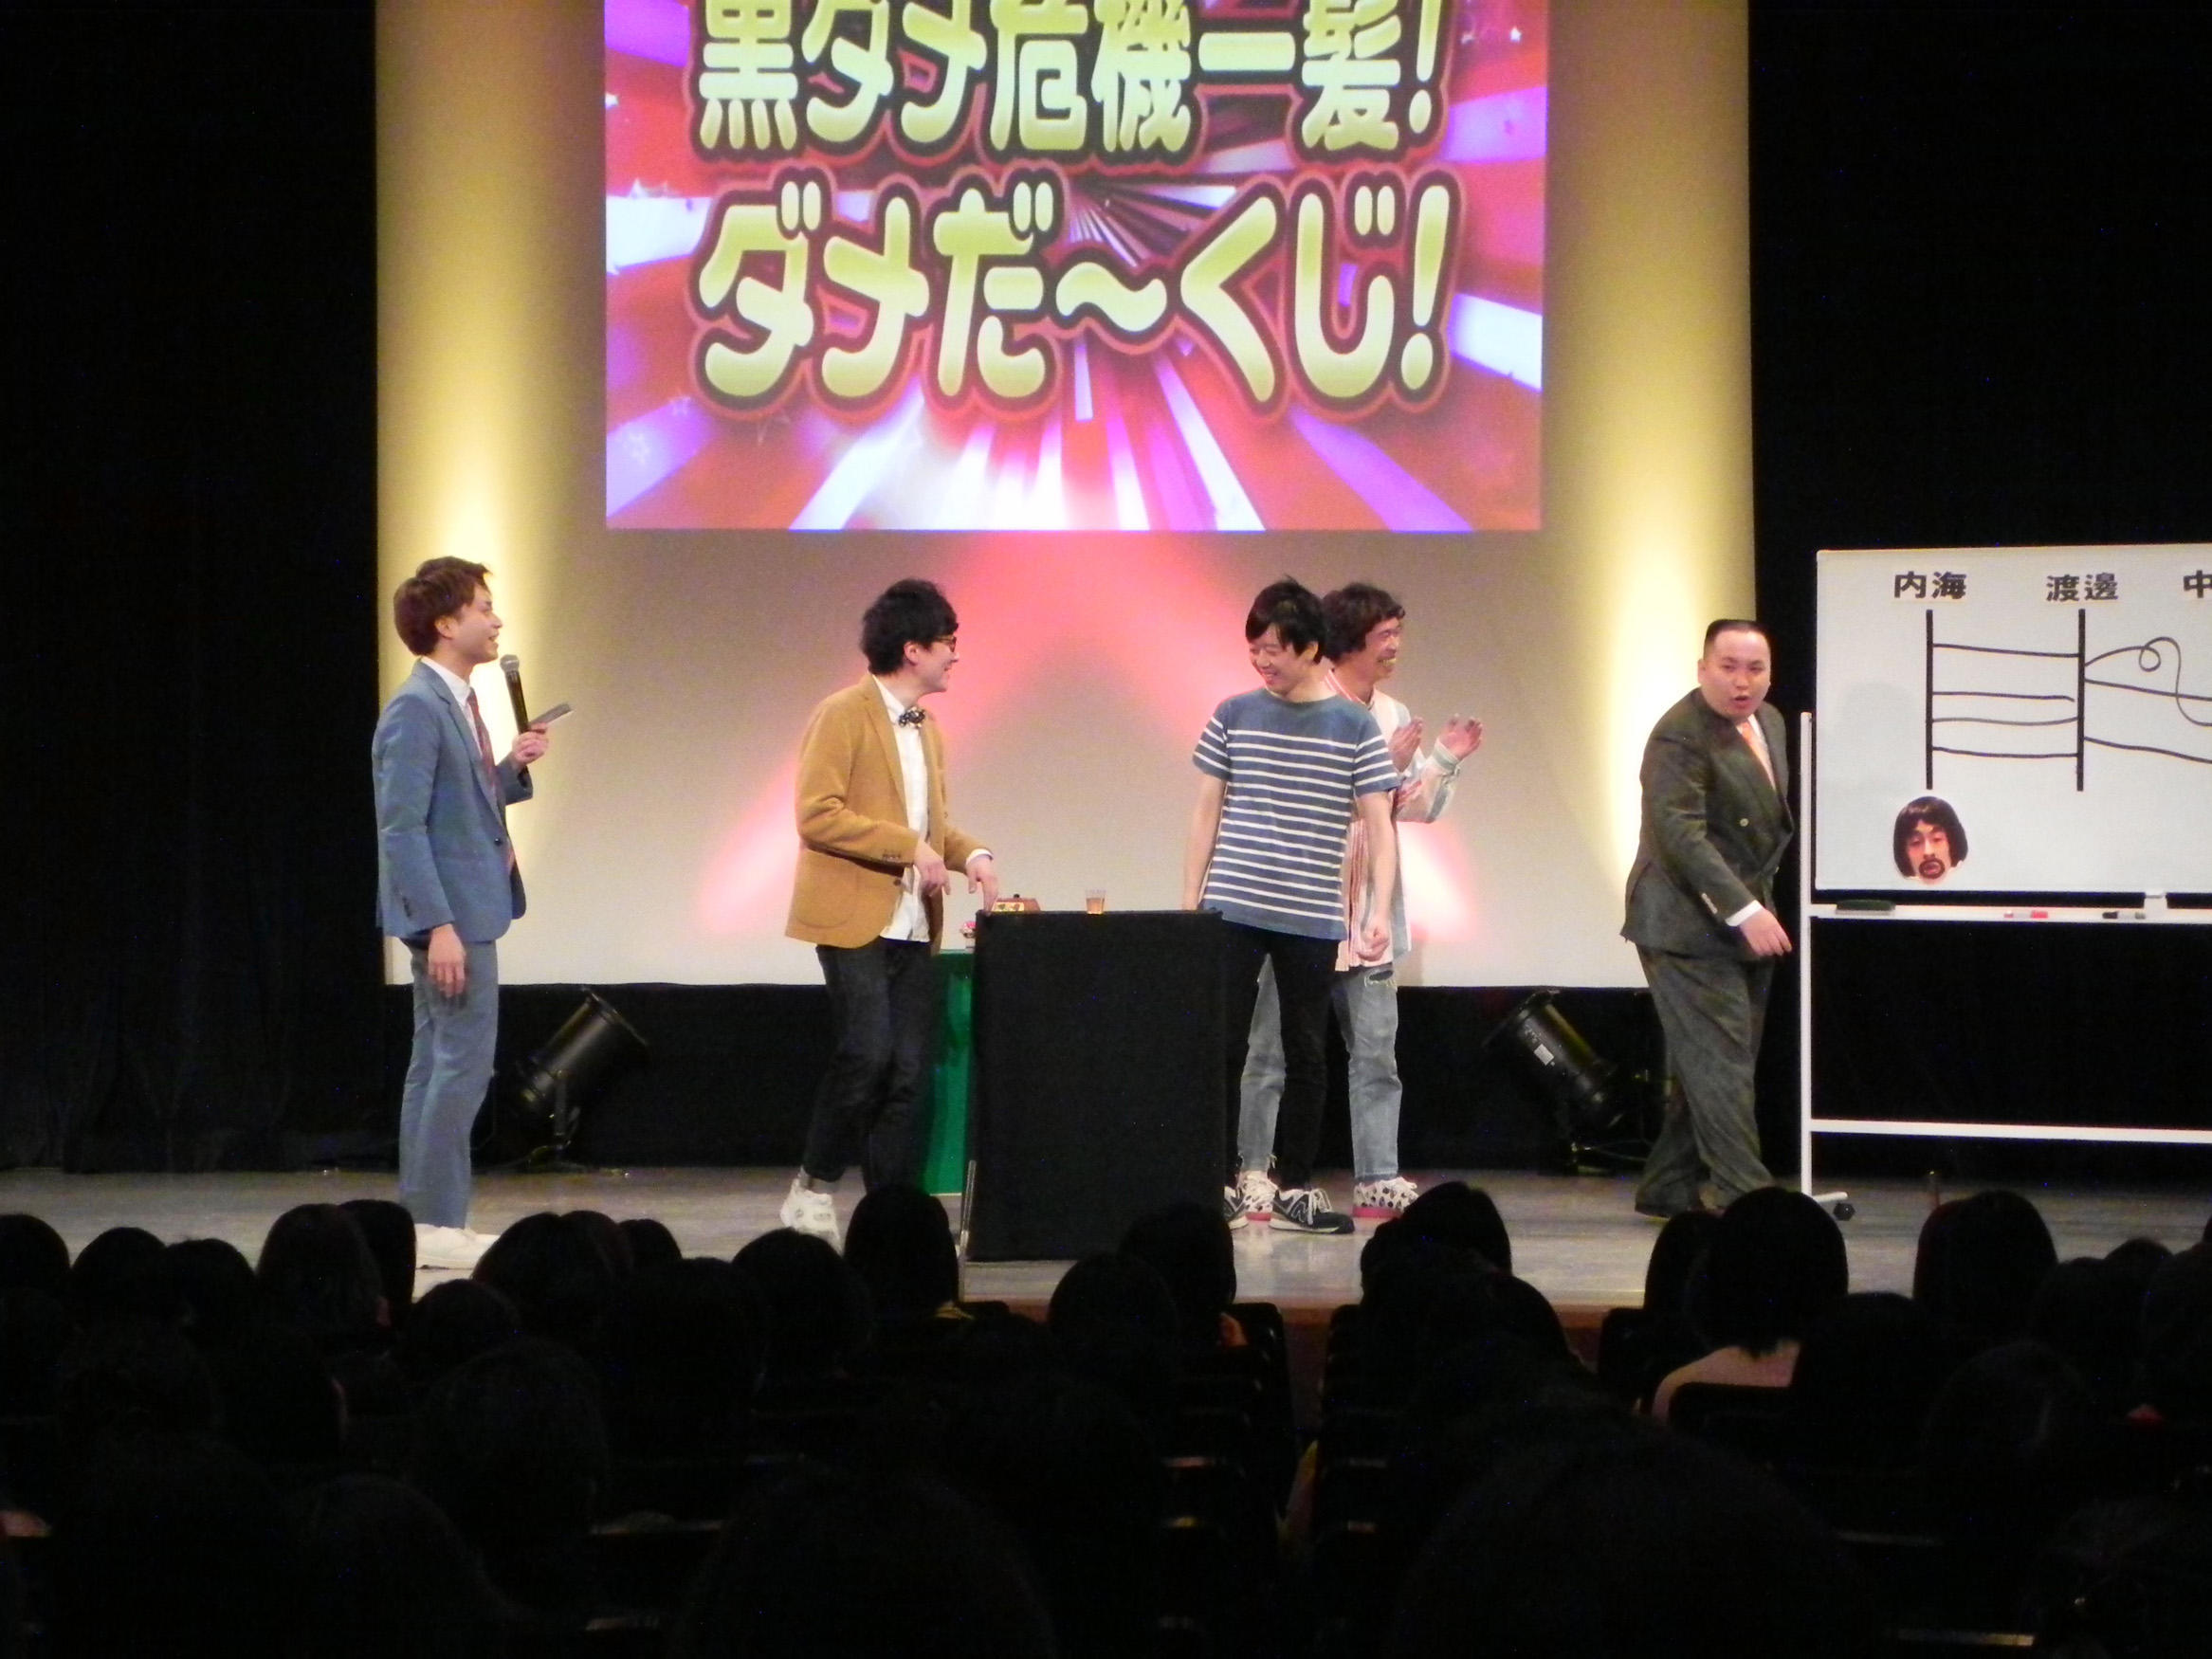 http://news.yoshimoto.co.jp/20170425152738-5d1673eb0029ad3381c8c5dc11189f7725b4977a.jpg